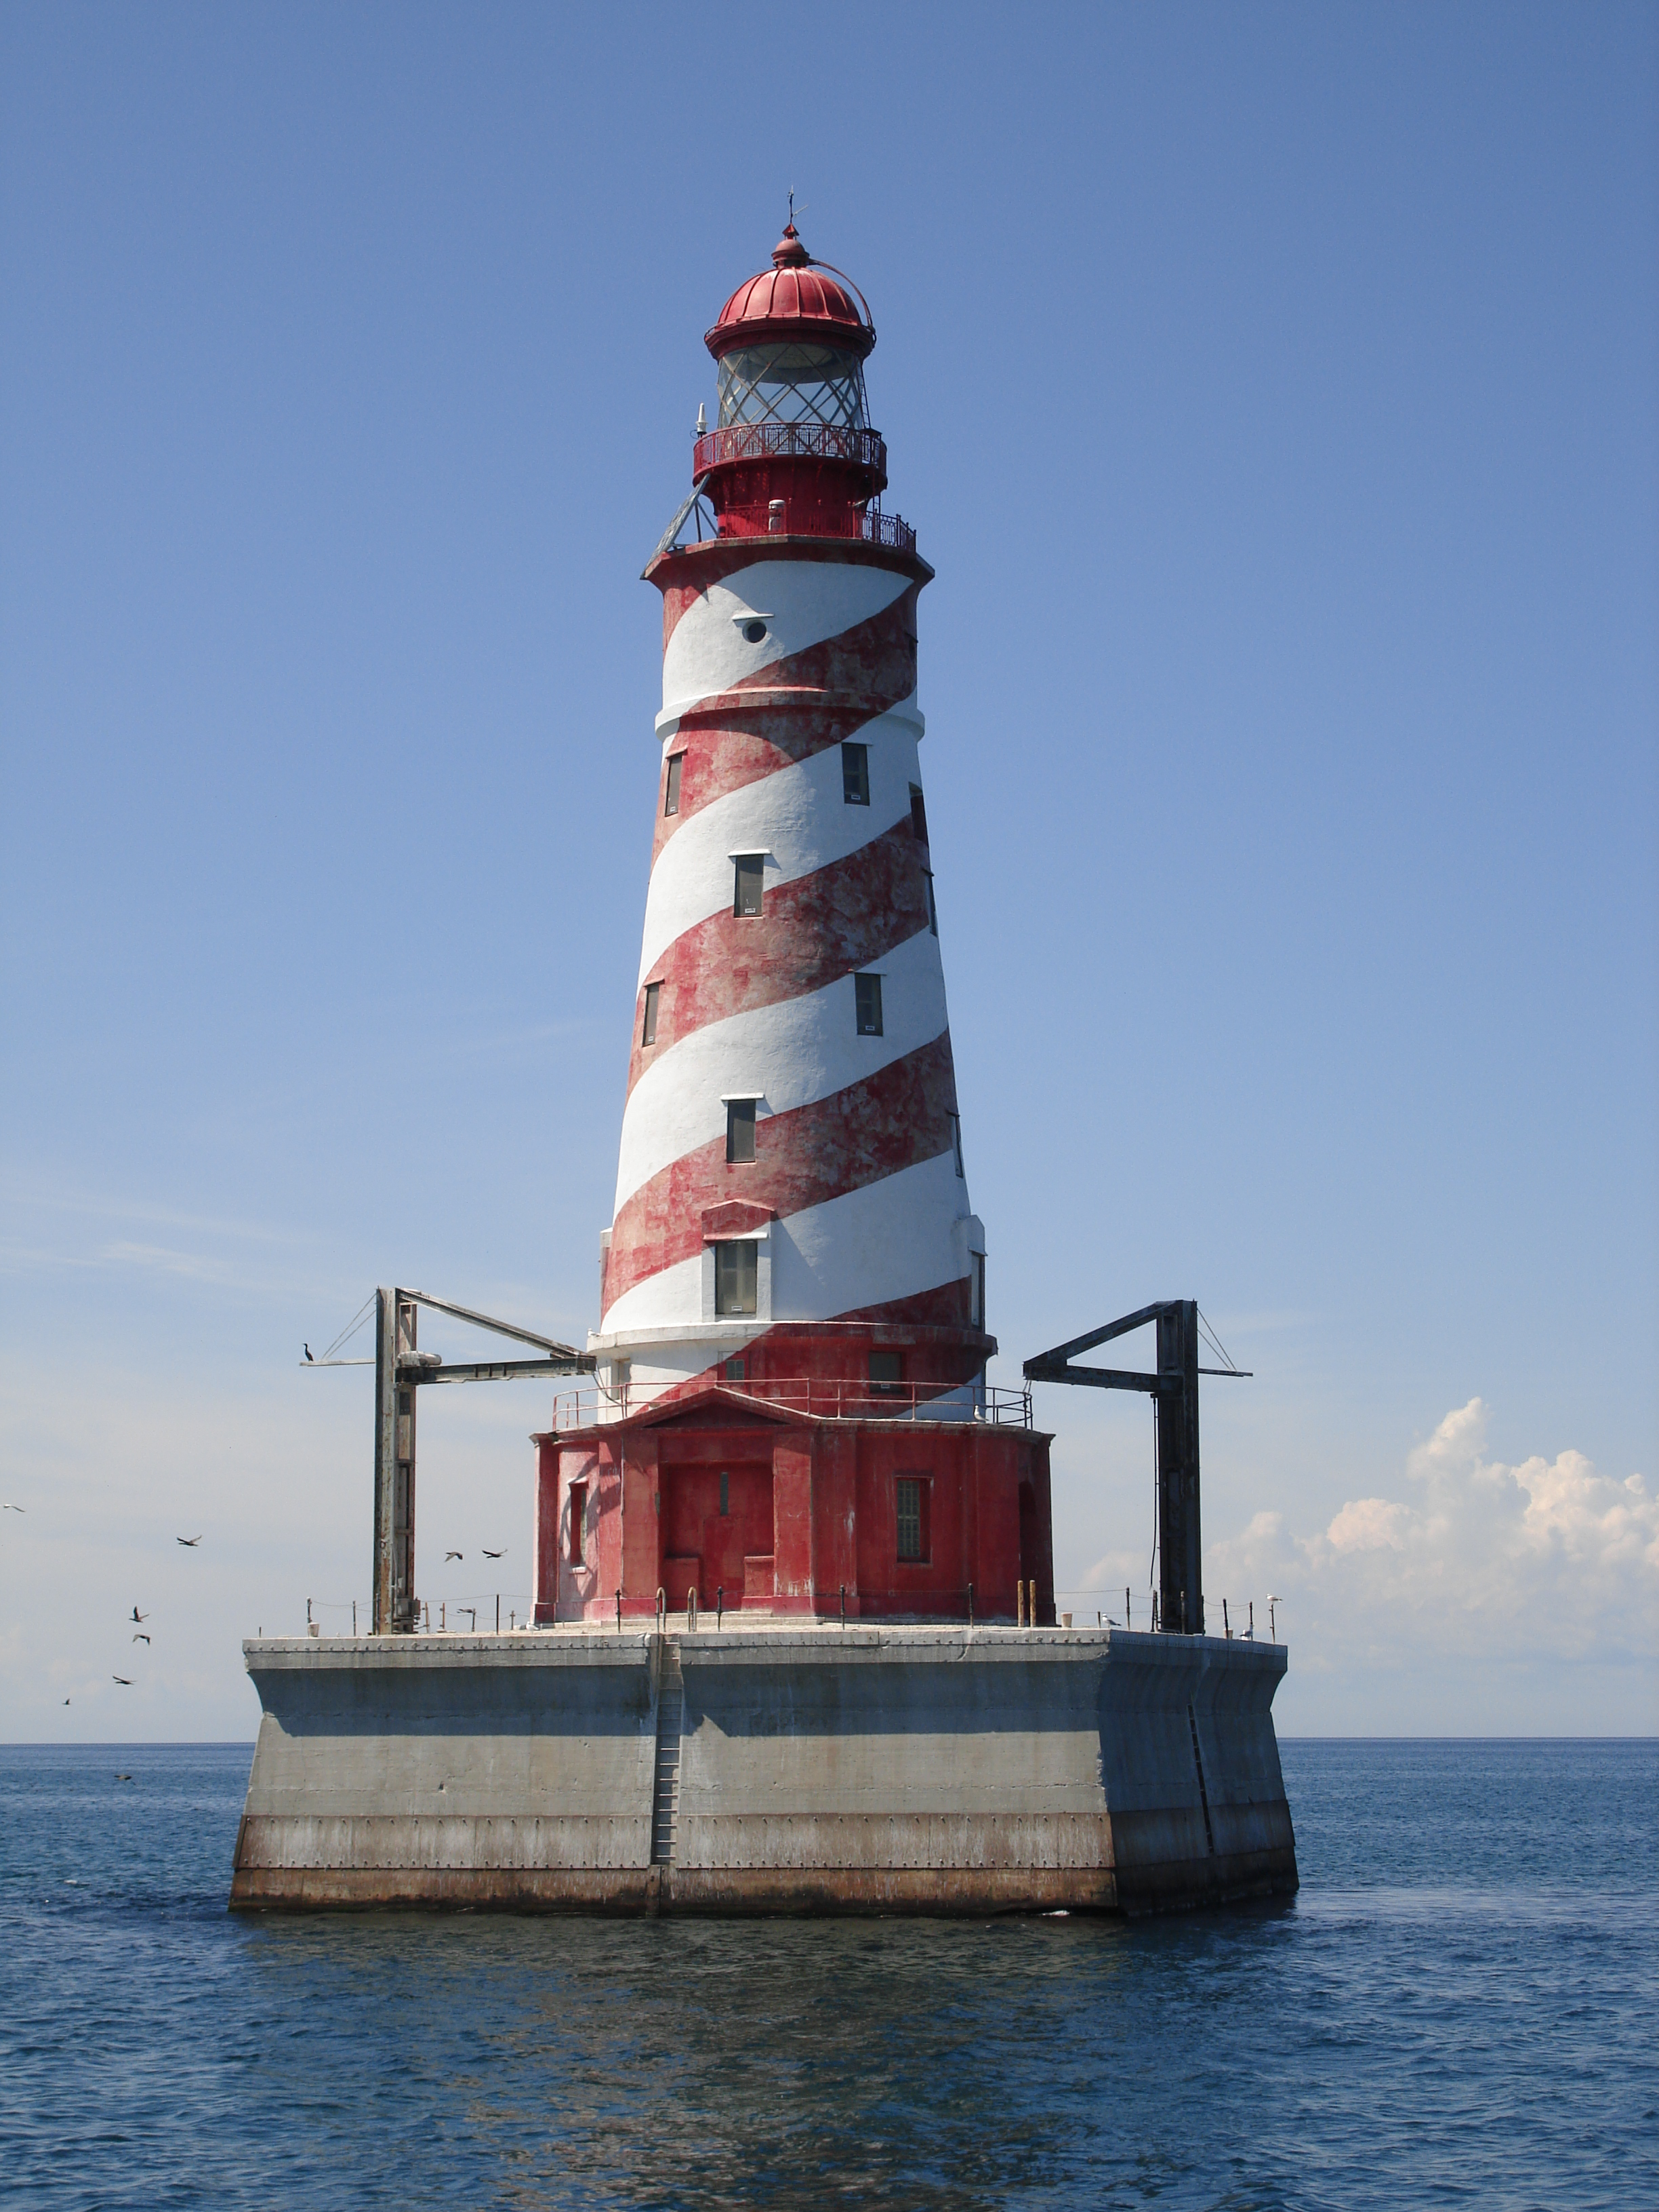 File:White Shoal Lighthouse.JPG - Wikimedia Commons